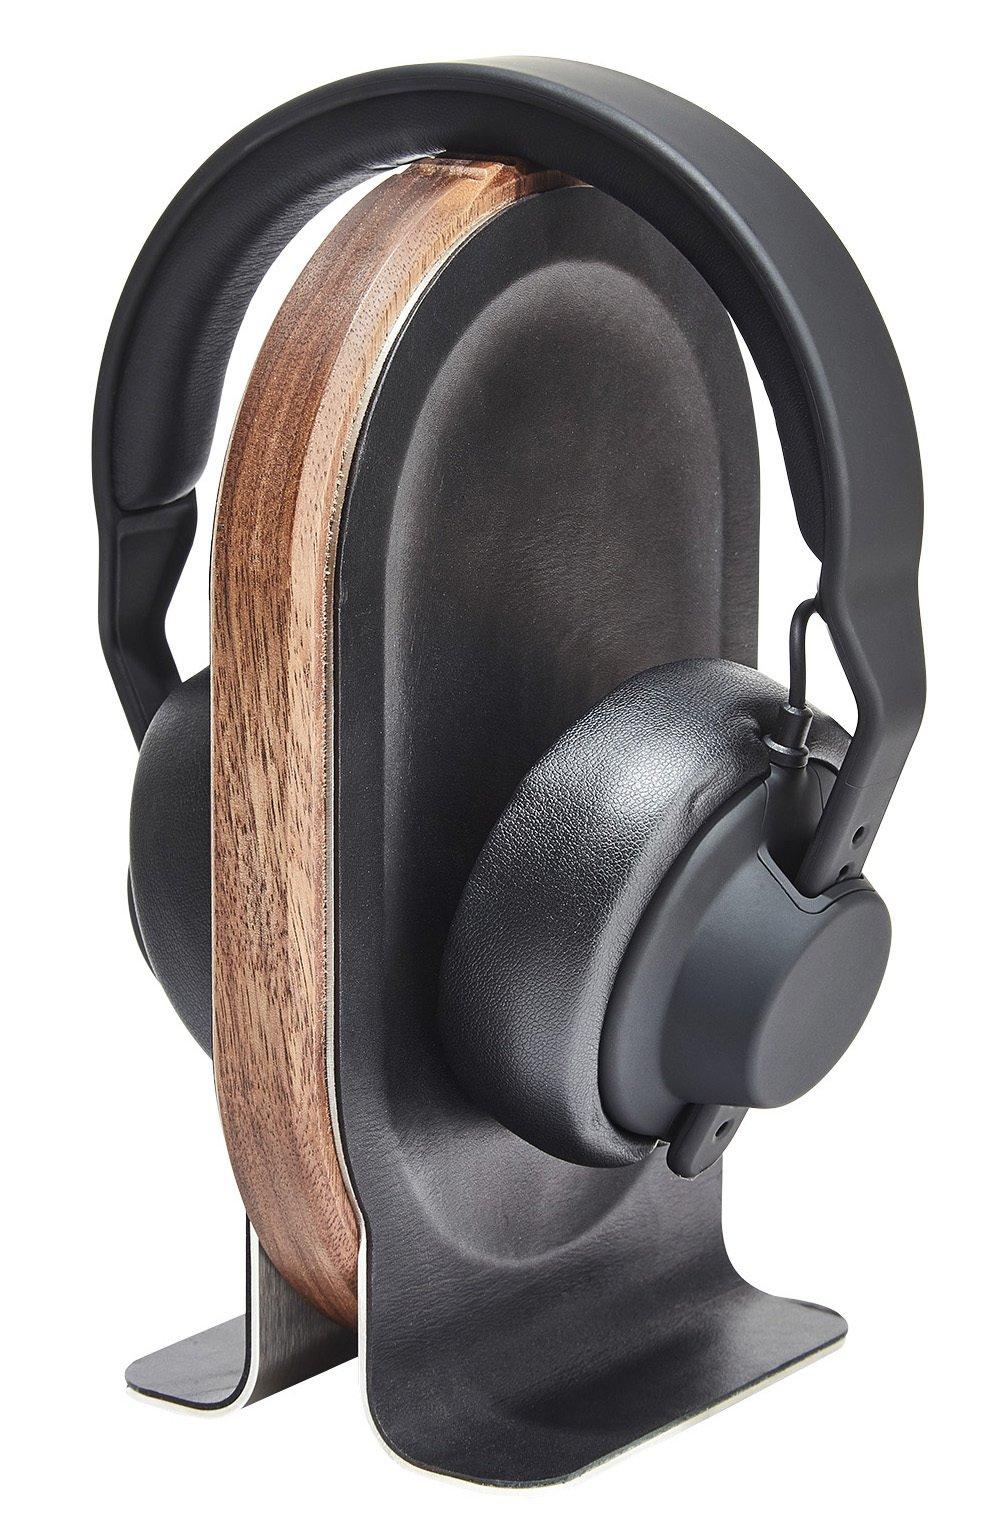 Headphone-Stand-Grovemade